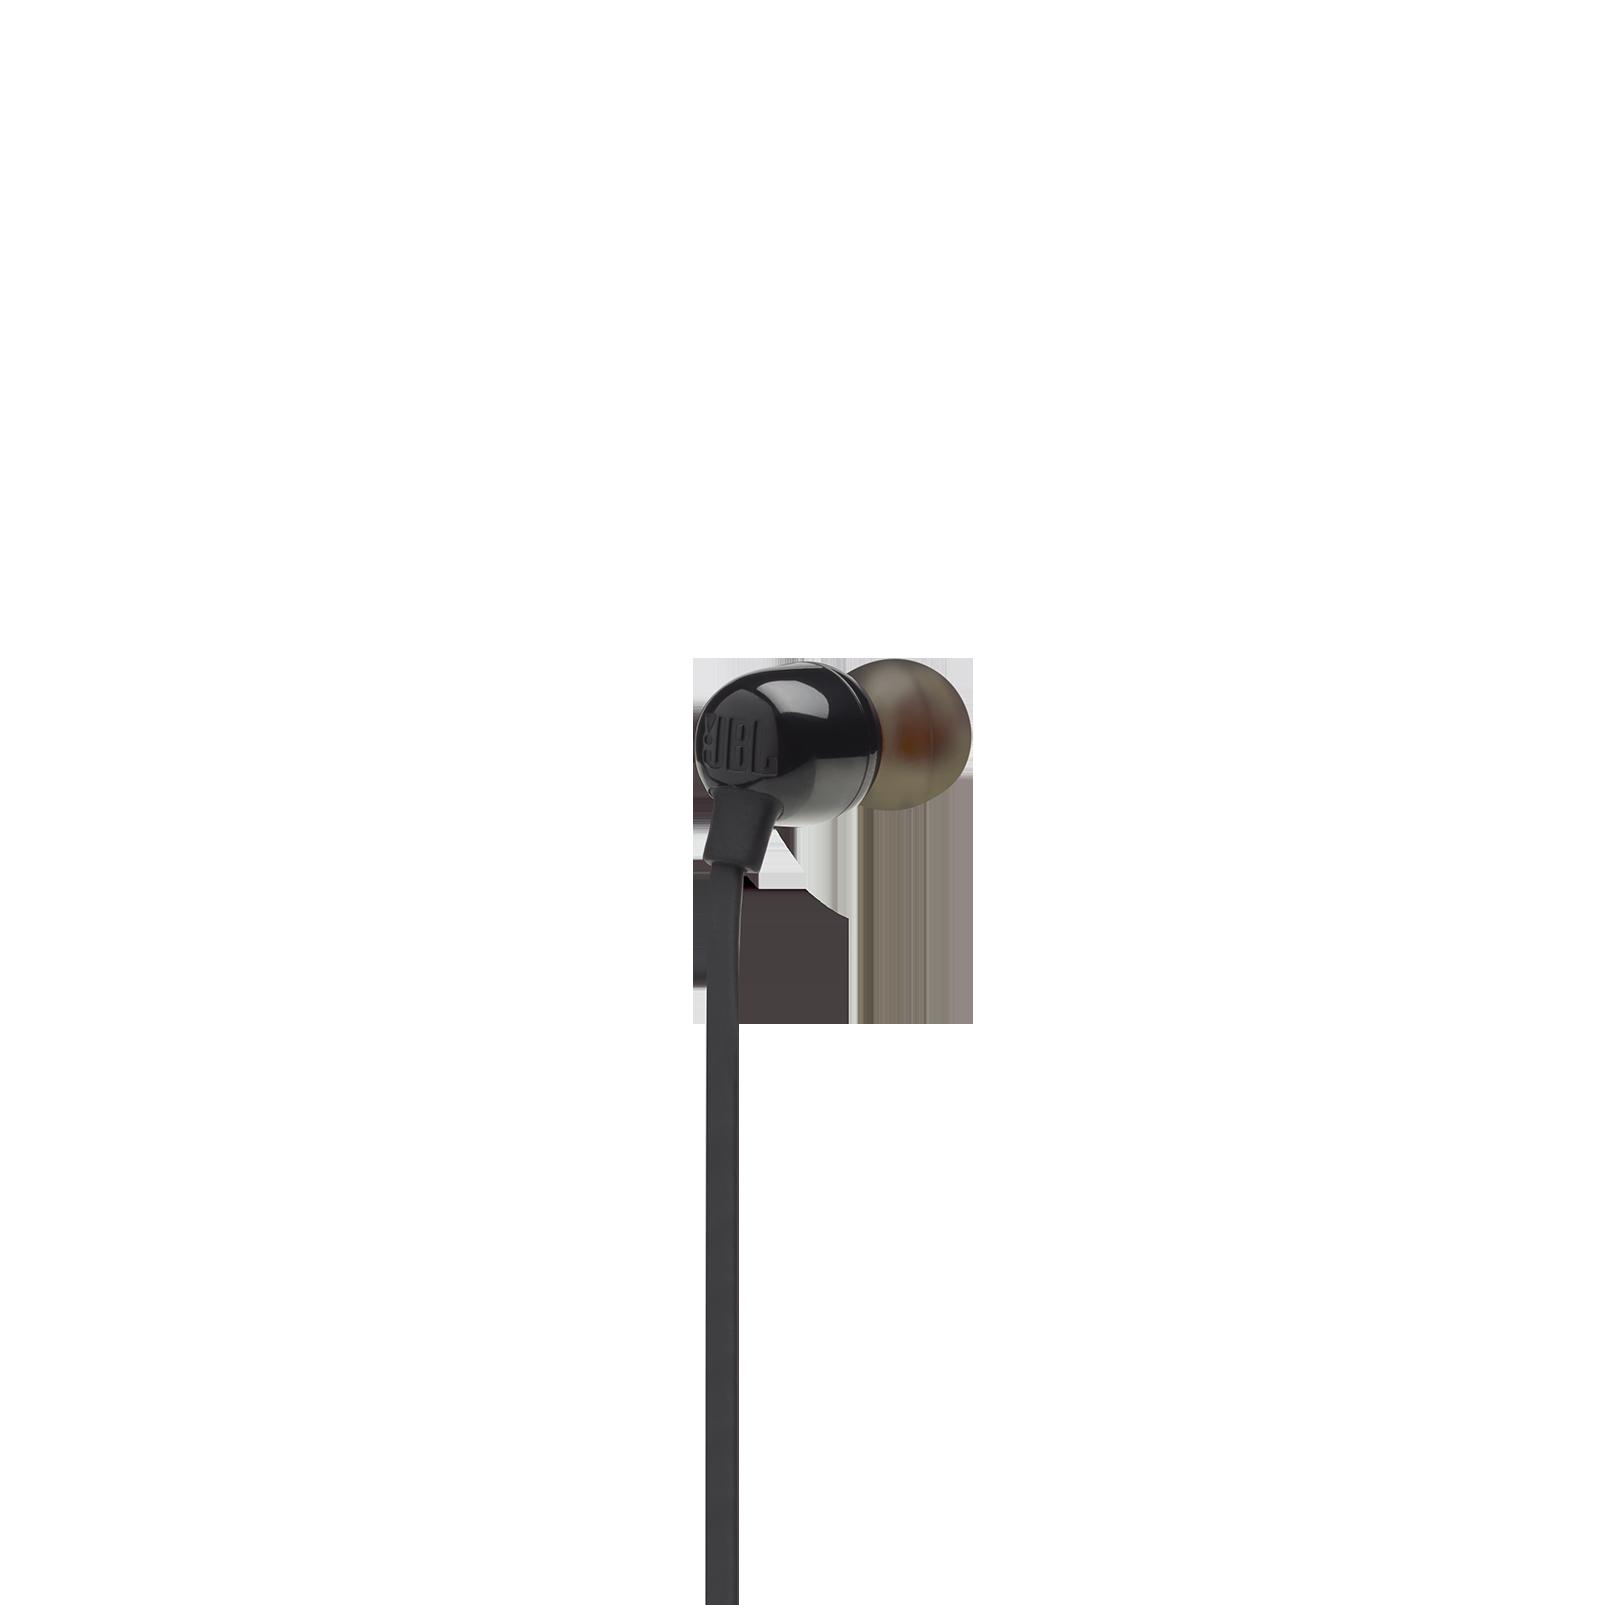 Fone de Ouvido com Microfone Bluetooth T115BT Preto JBLT115BTBLK - JBL